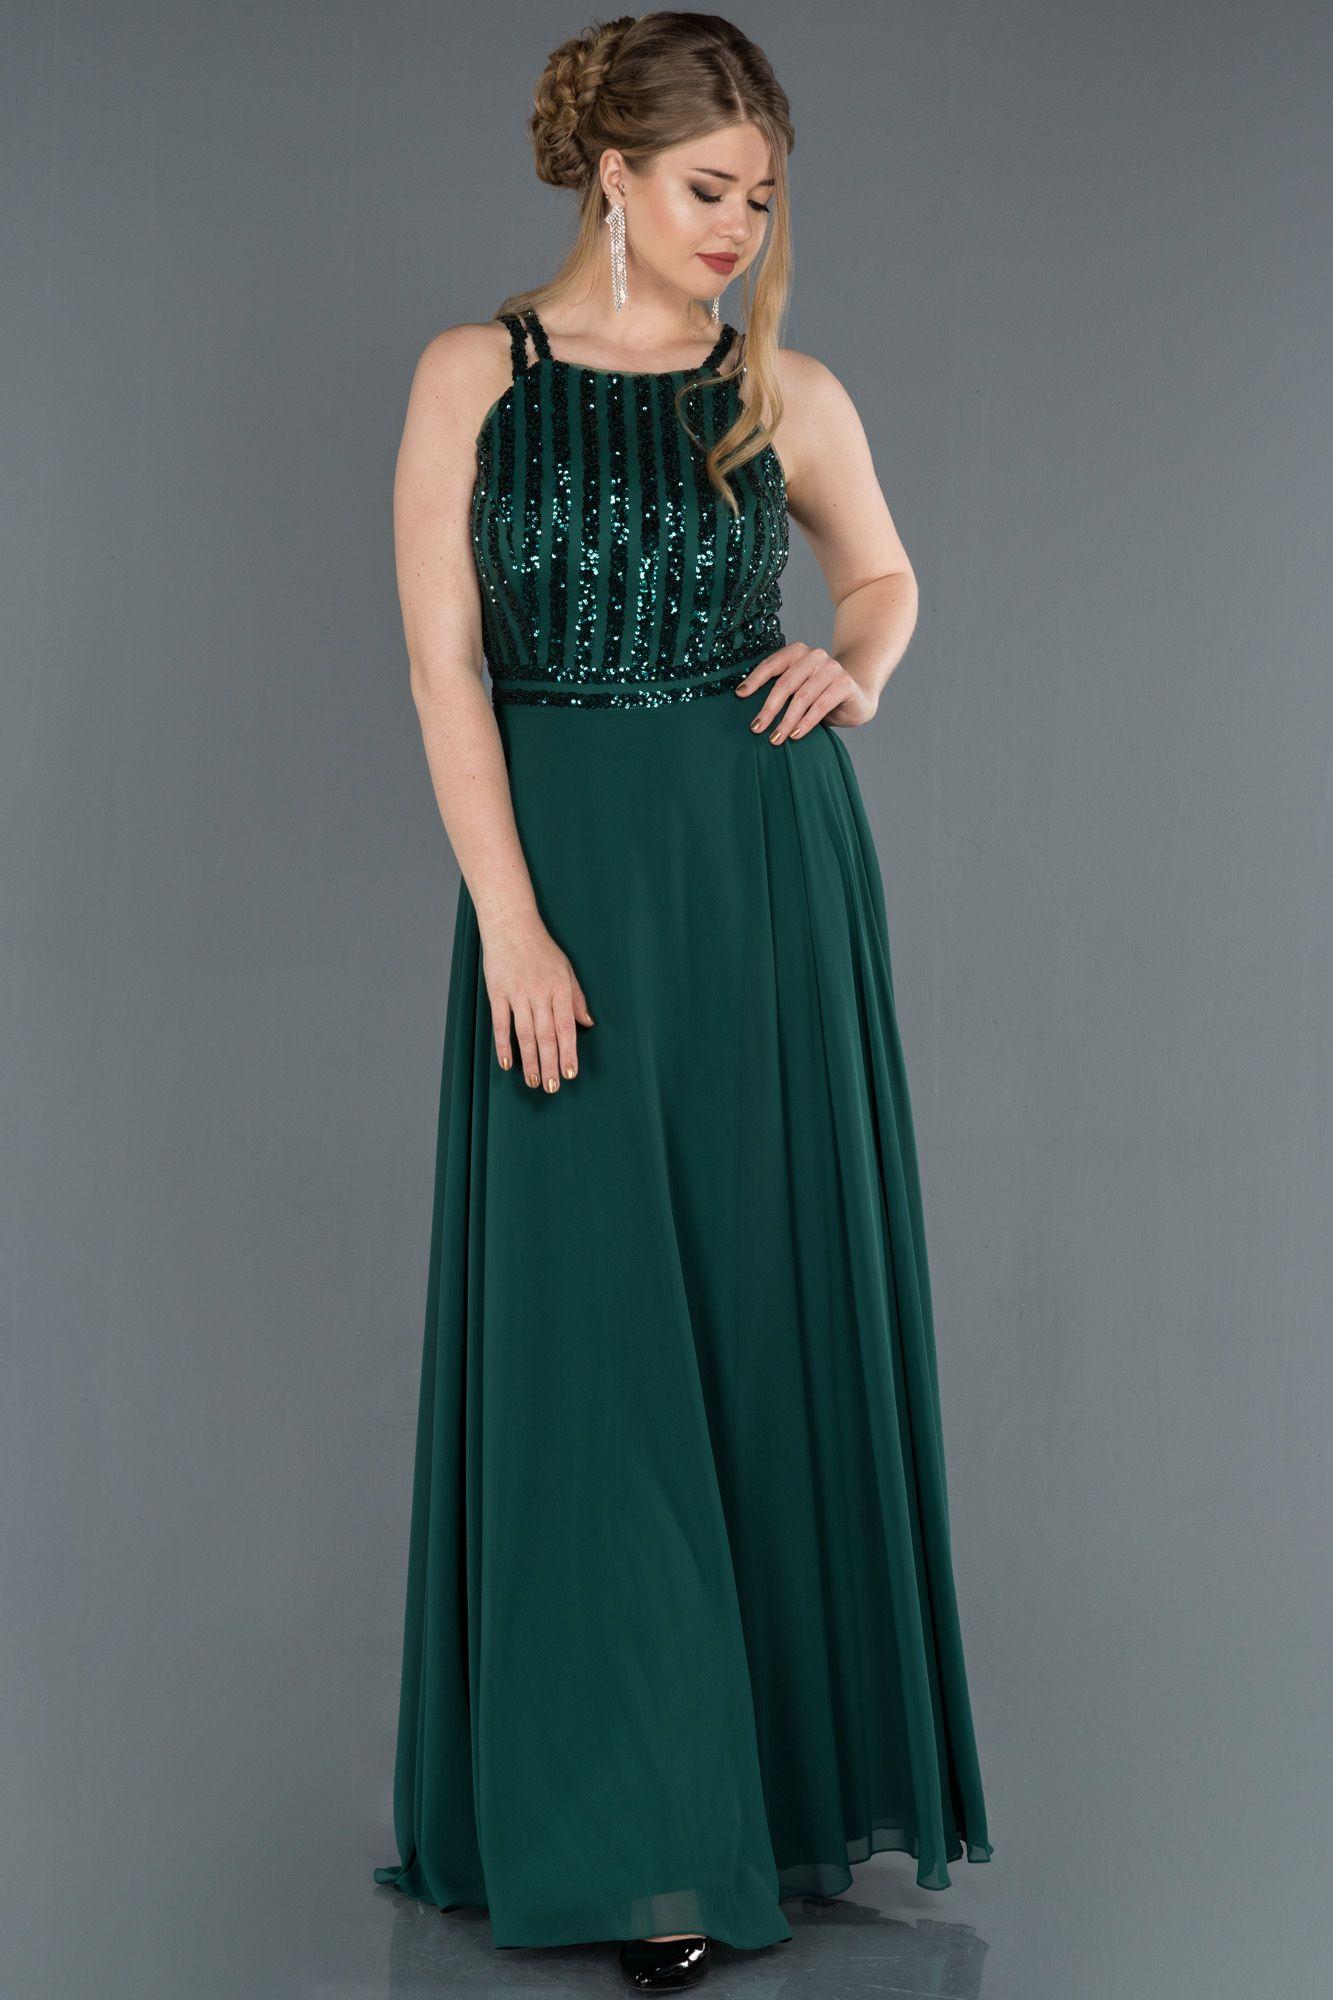 Zumrut Uzun Pul Payetli Sifon Abiye Elbise Abu1258 2020 Elbise The Dress Elbise Modelleri